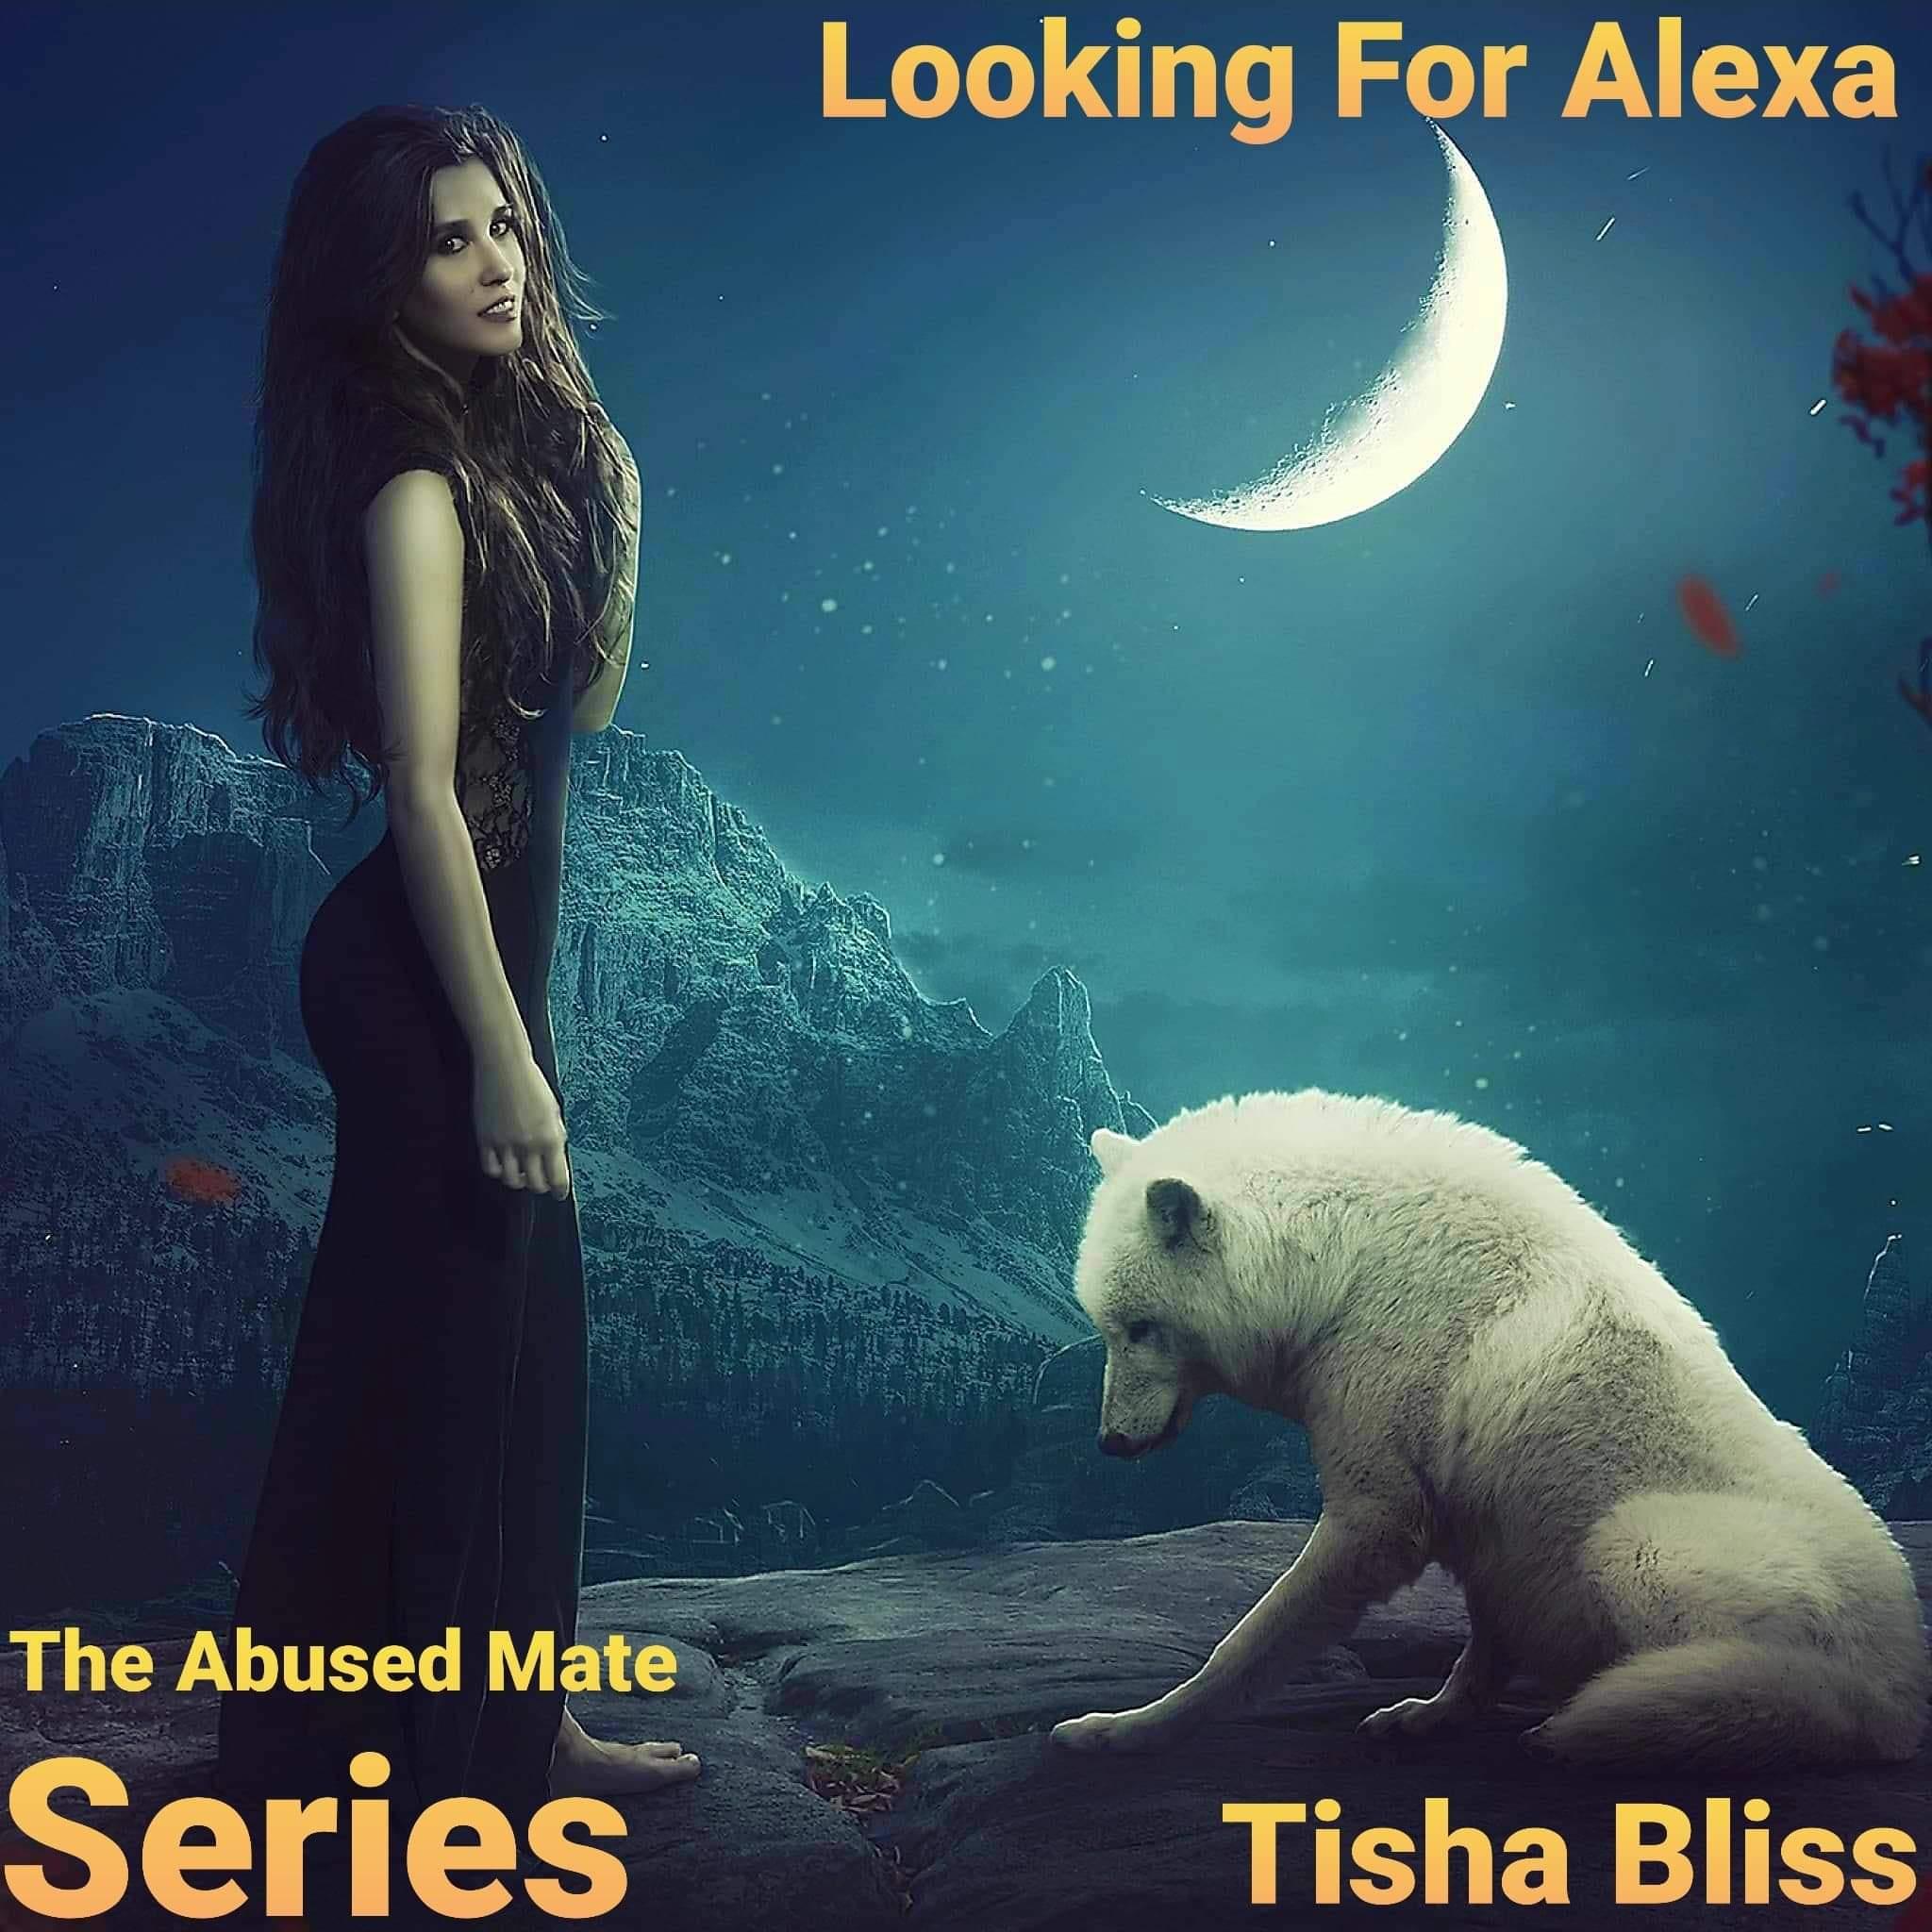 Looking for Alexa